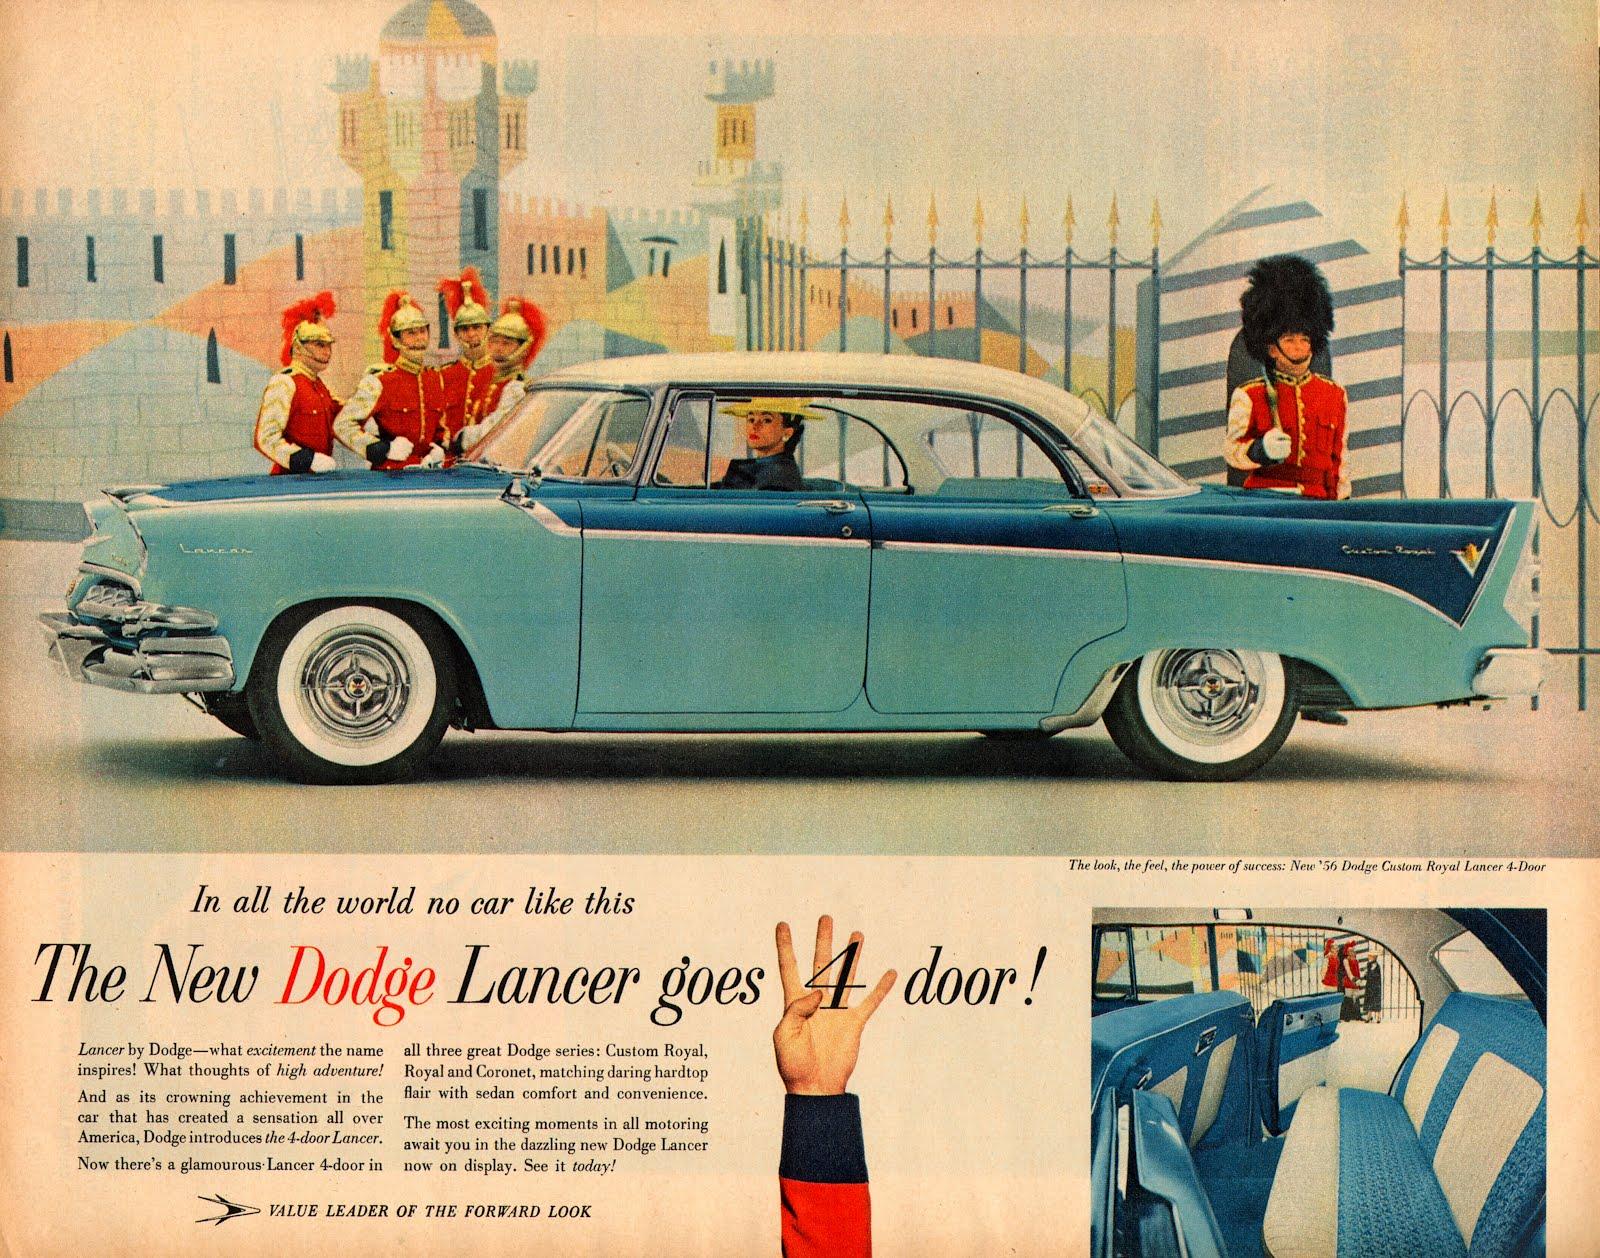 Vintage Car Advertising Posters in US from 1957-1960 ~ vintage everyday